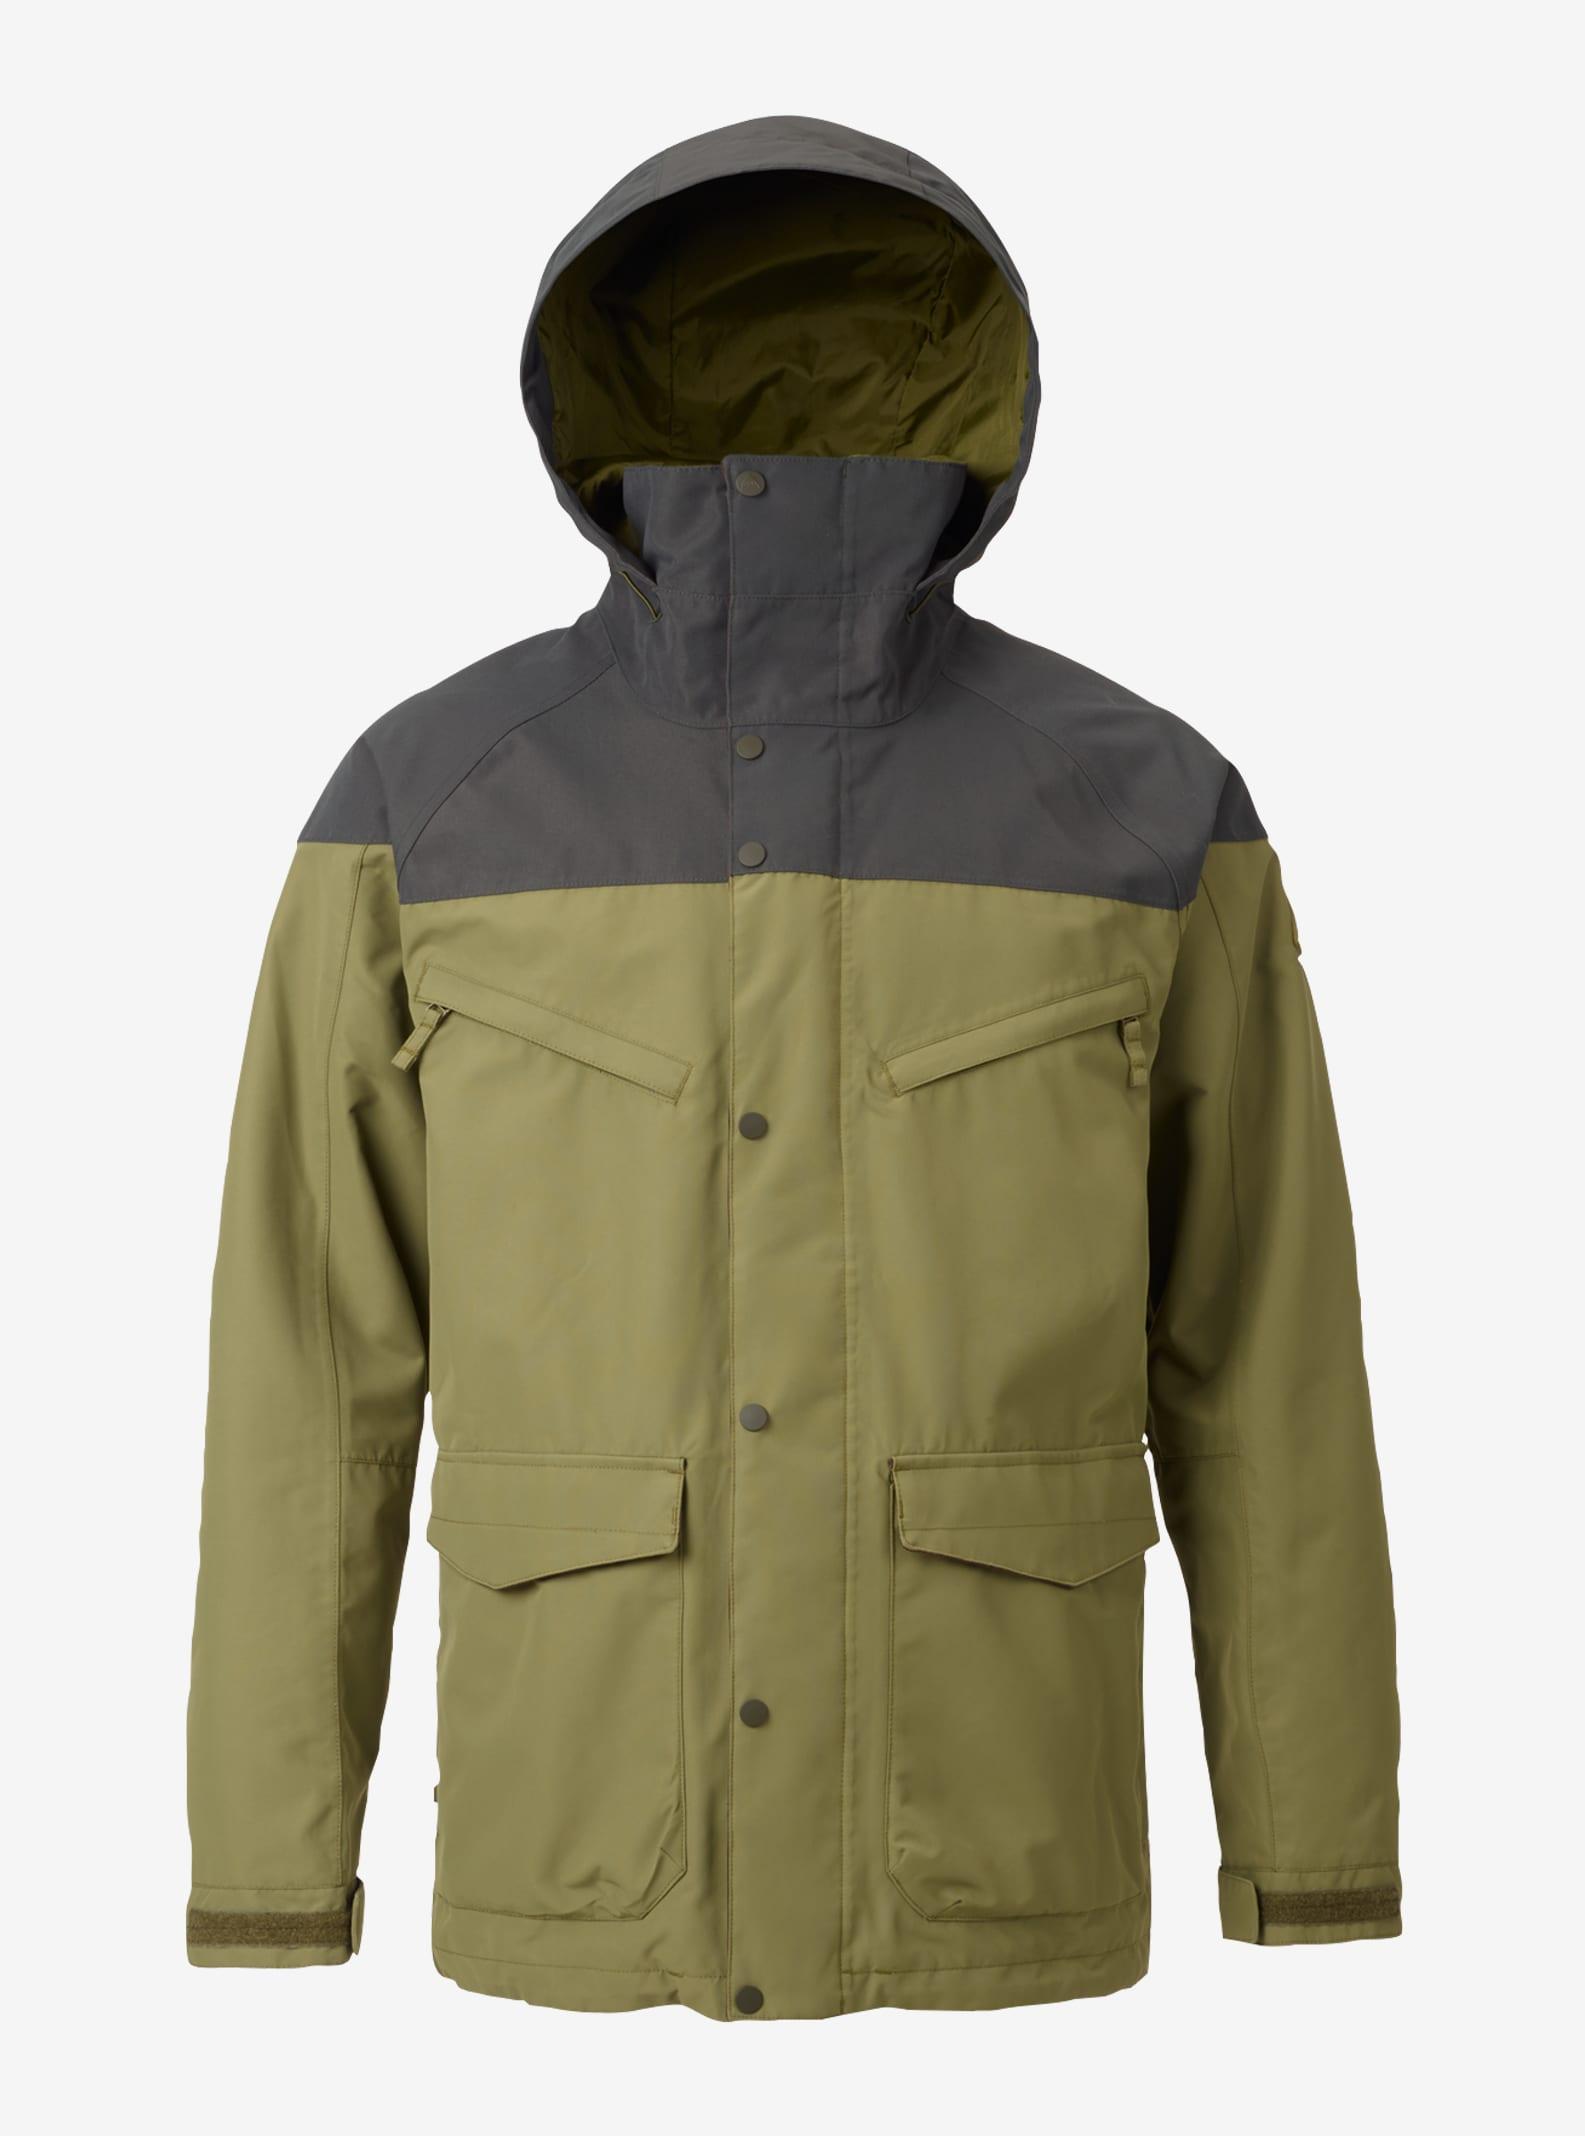 Men's Burton Breach Shell Jacket shown in Forest Night / Olive Branch